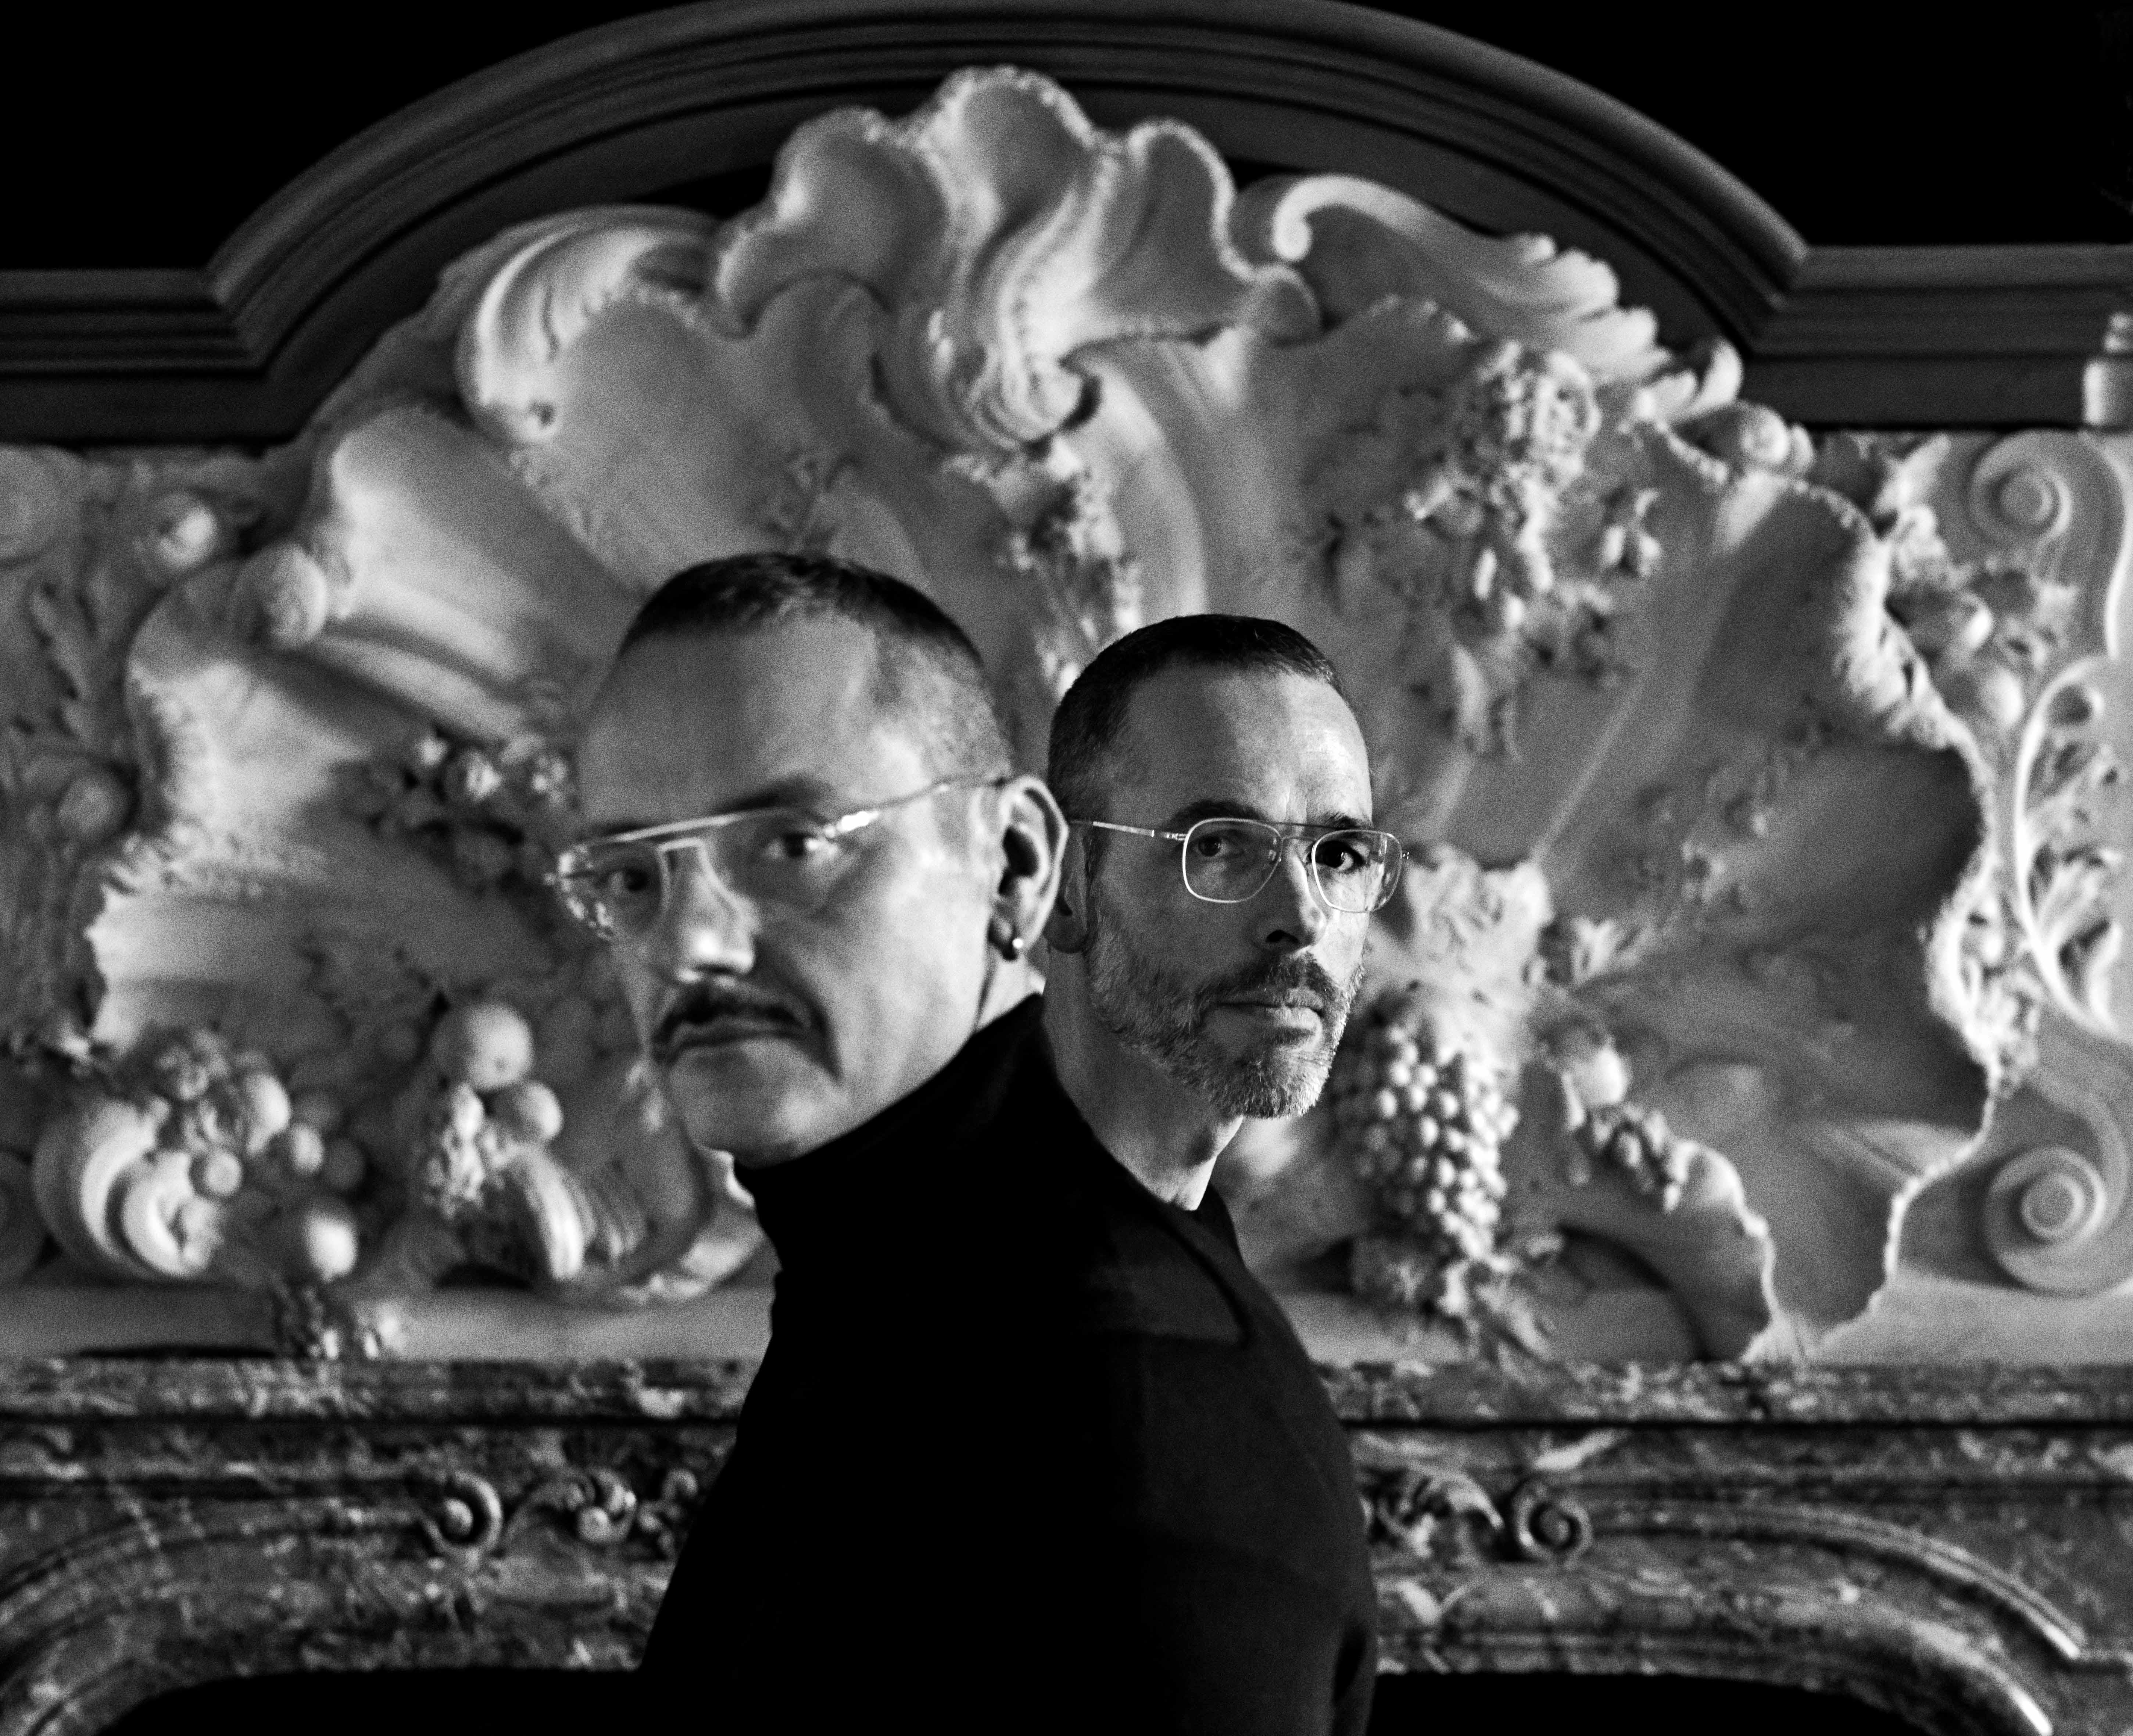 Viktor Horsting et Rolf Snoeren - Photo © Anton Corbijn